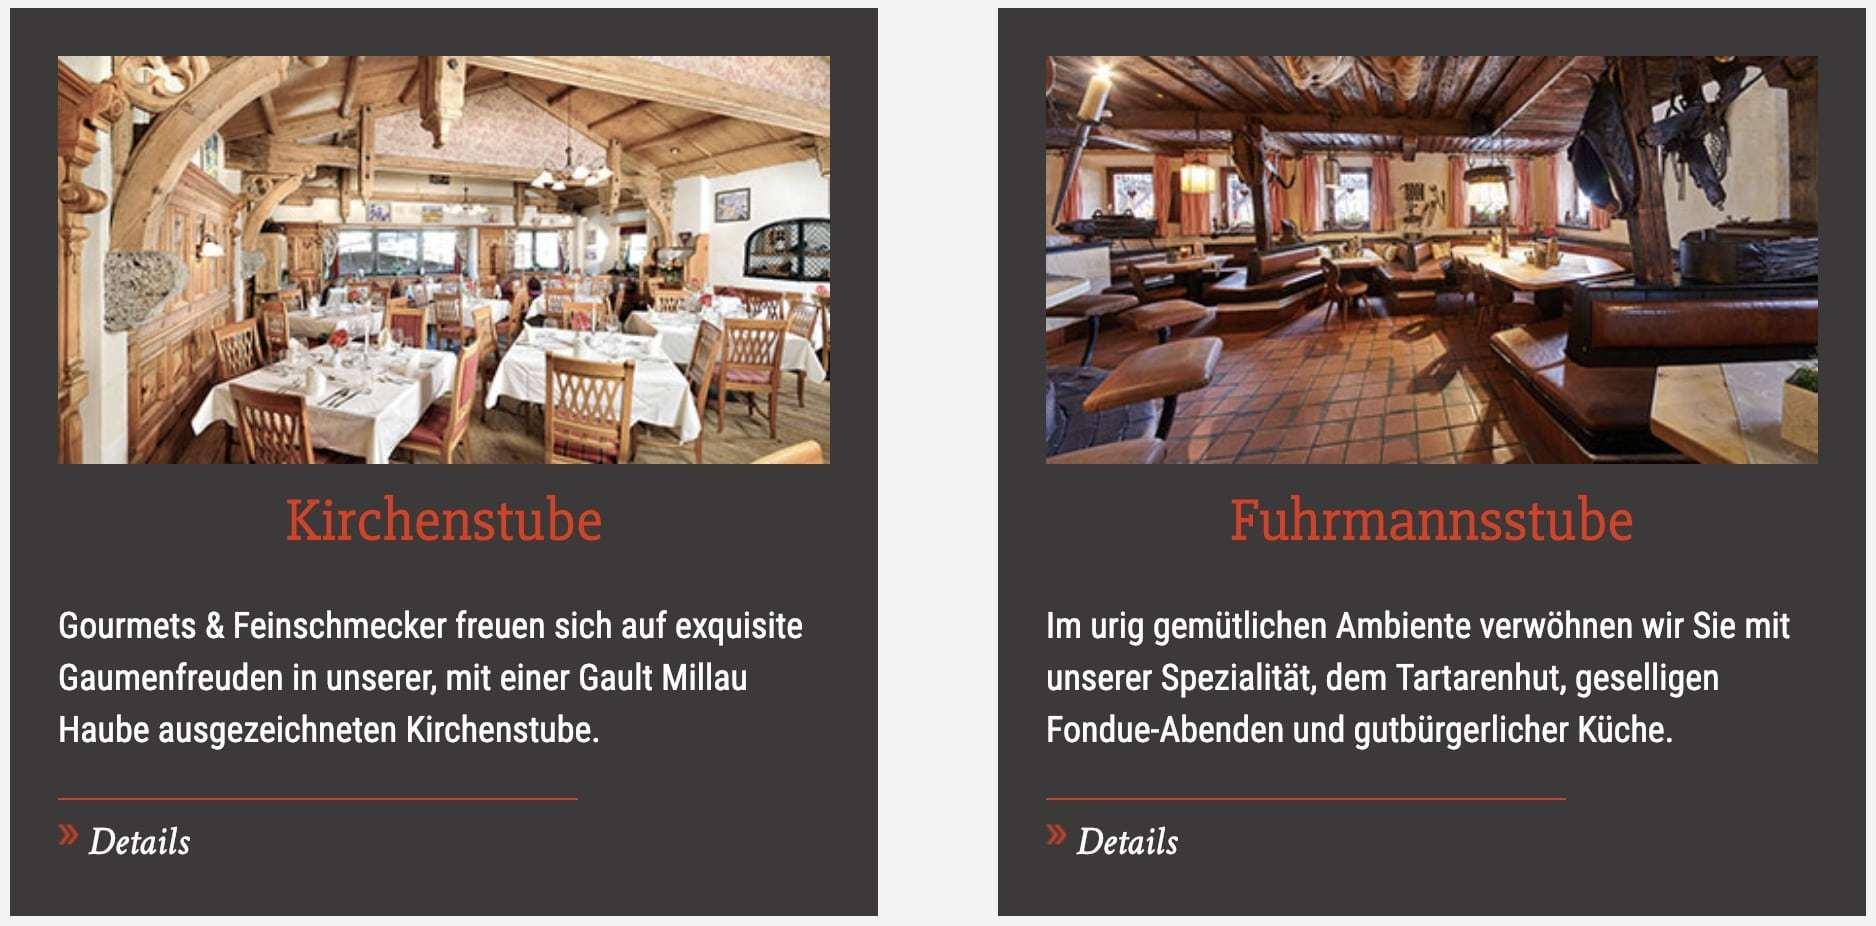 Hotel Zur Dorfschmiede Partnerprogramm Restaurantangbebot